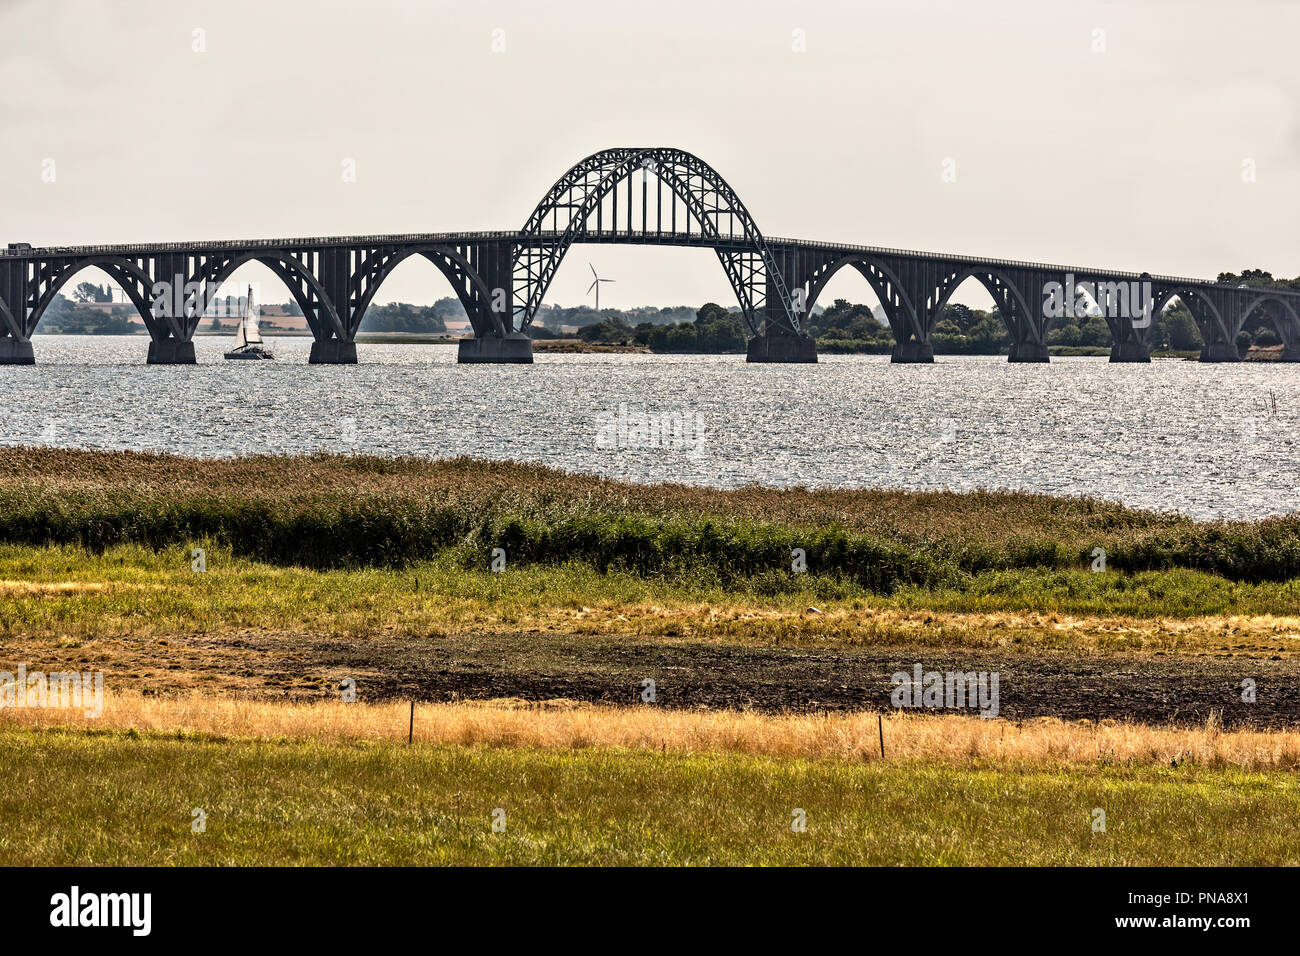 the Queen Alexandrina bridge - Stock Image